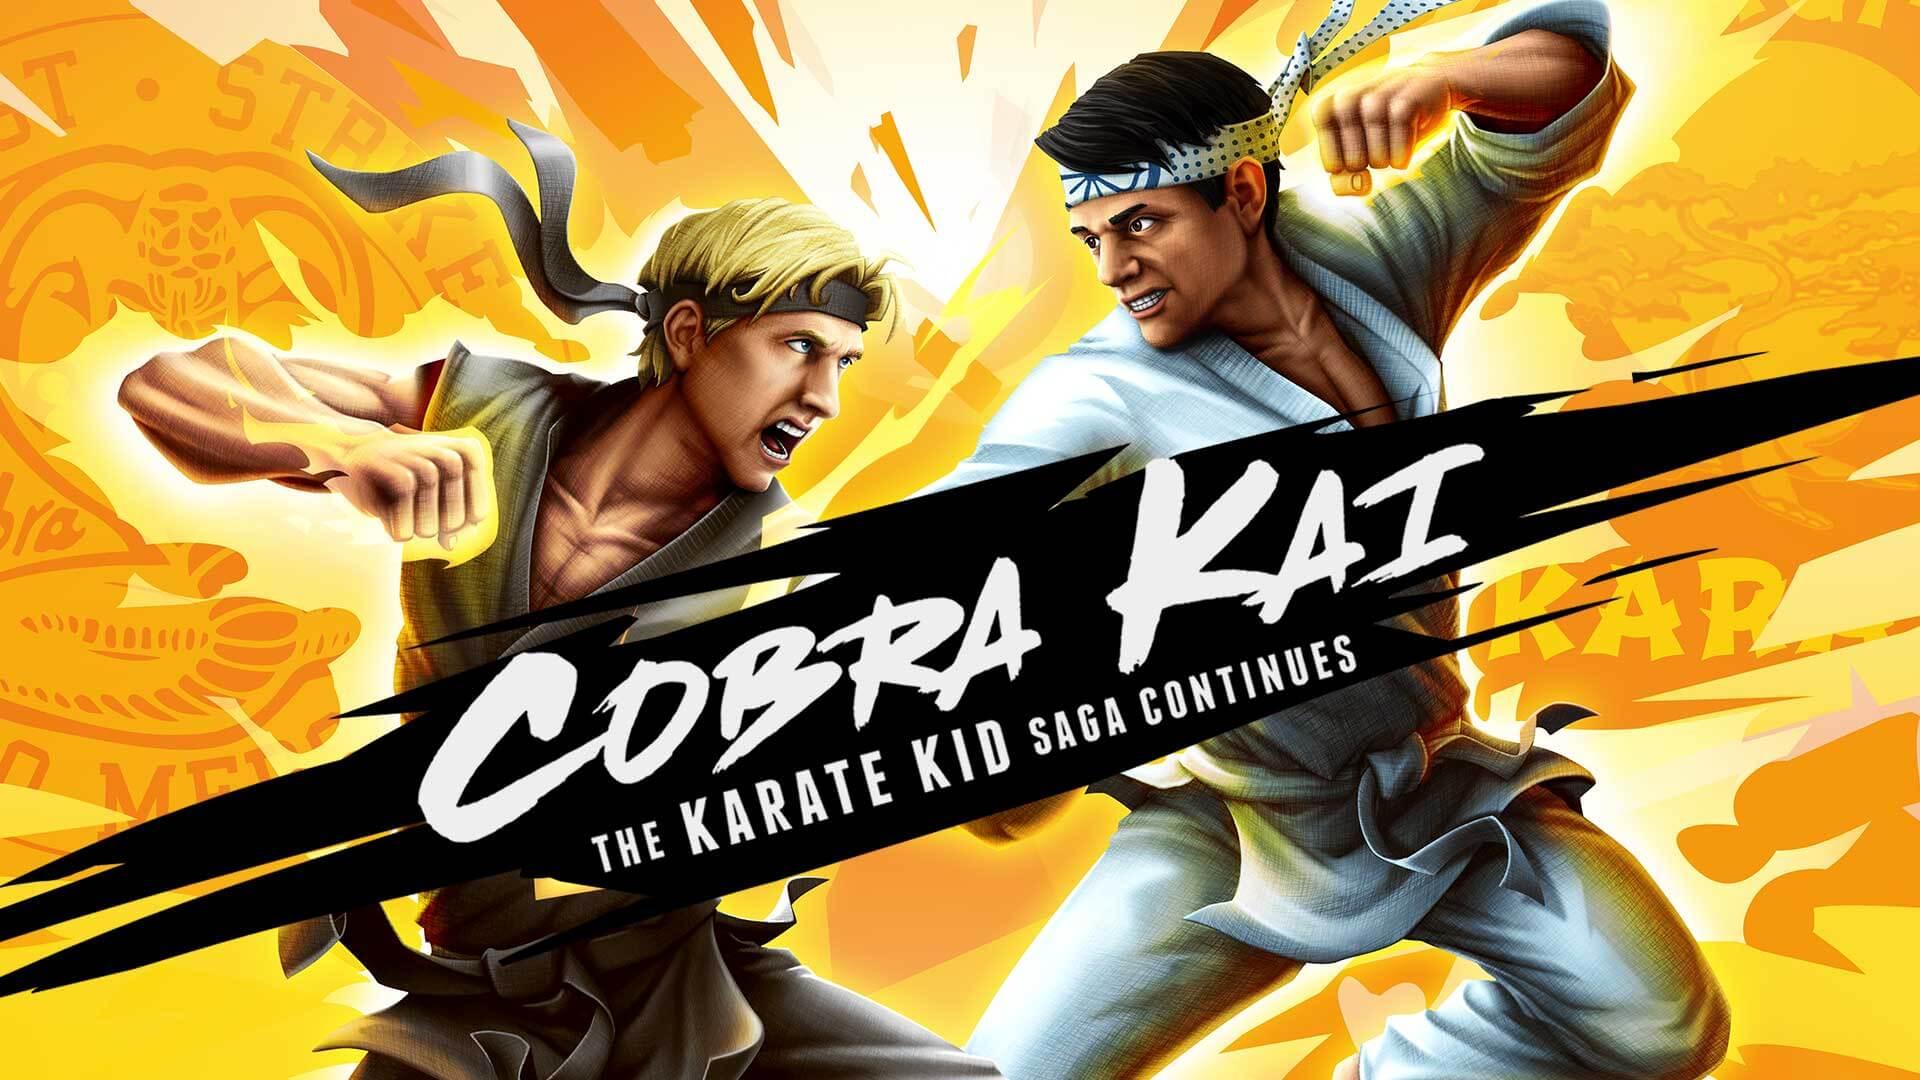 Cobra Kai: The Karate Kid Saga Continues Free PC Download